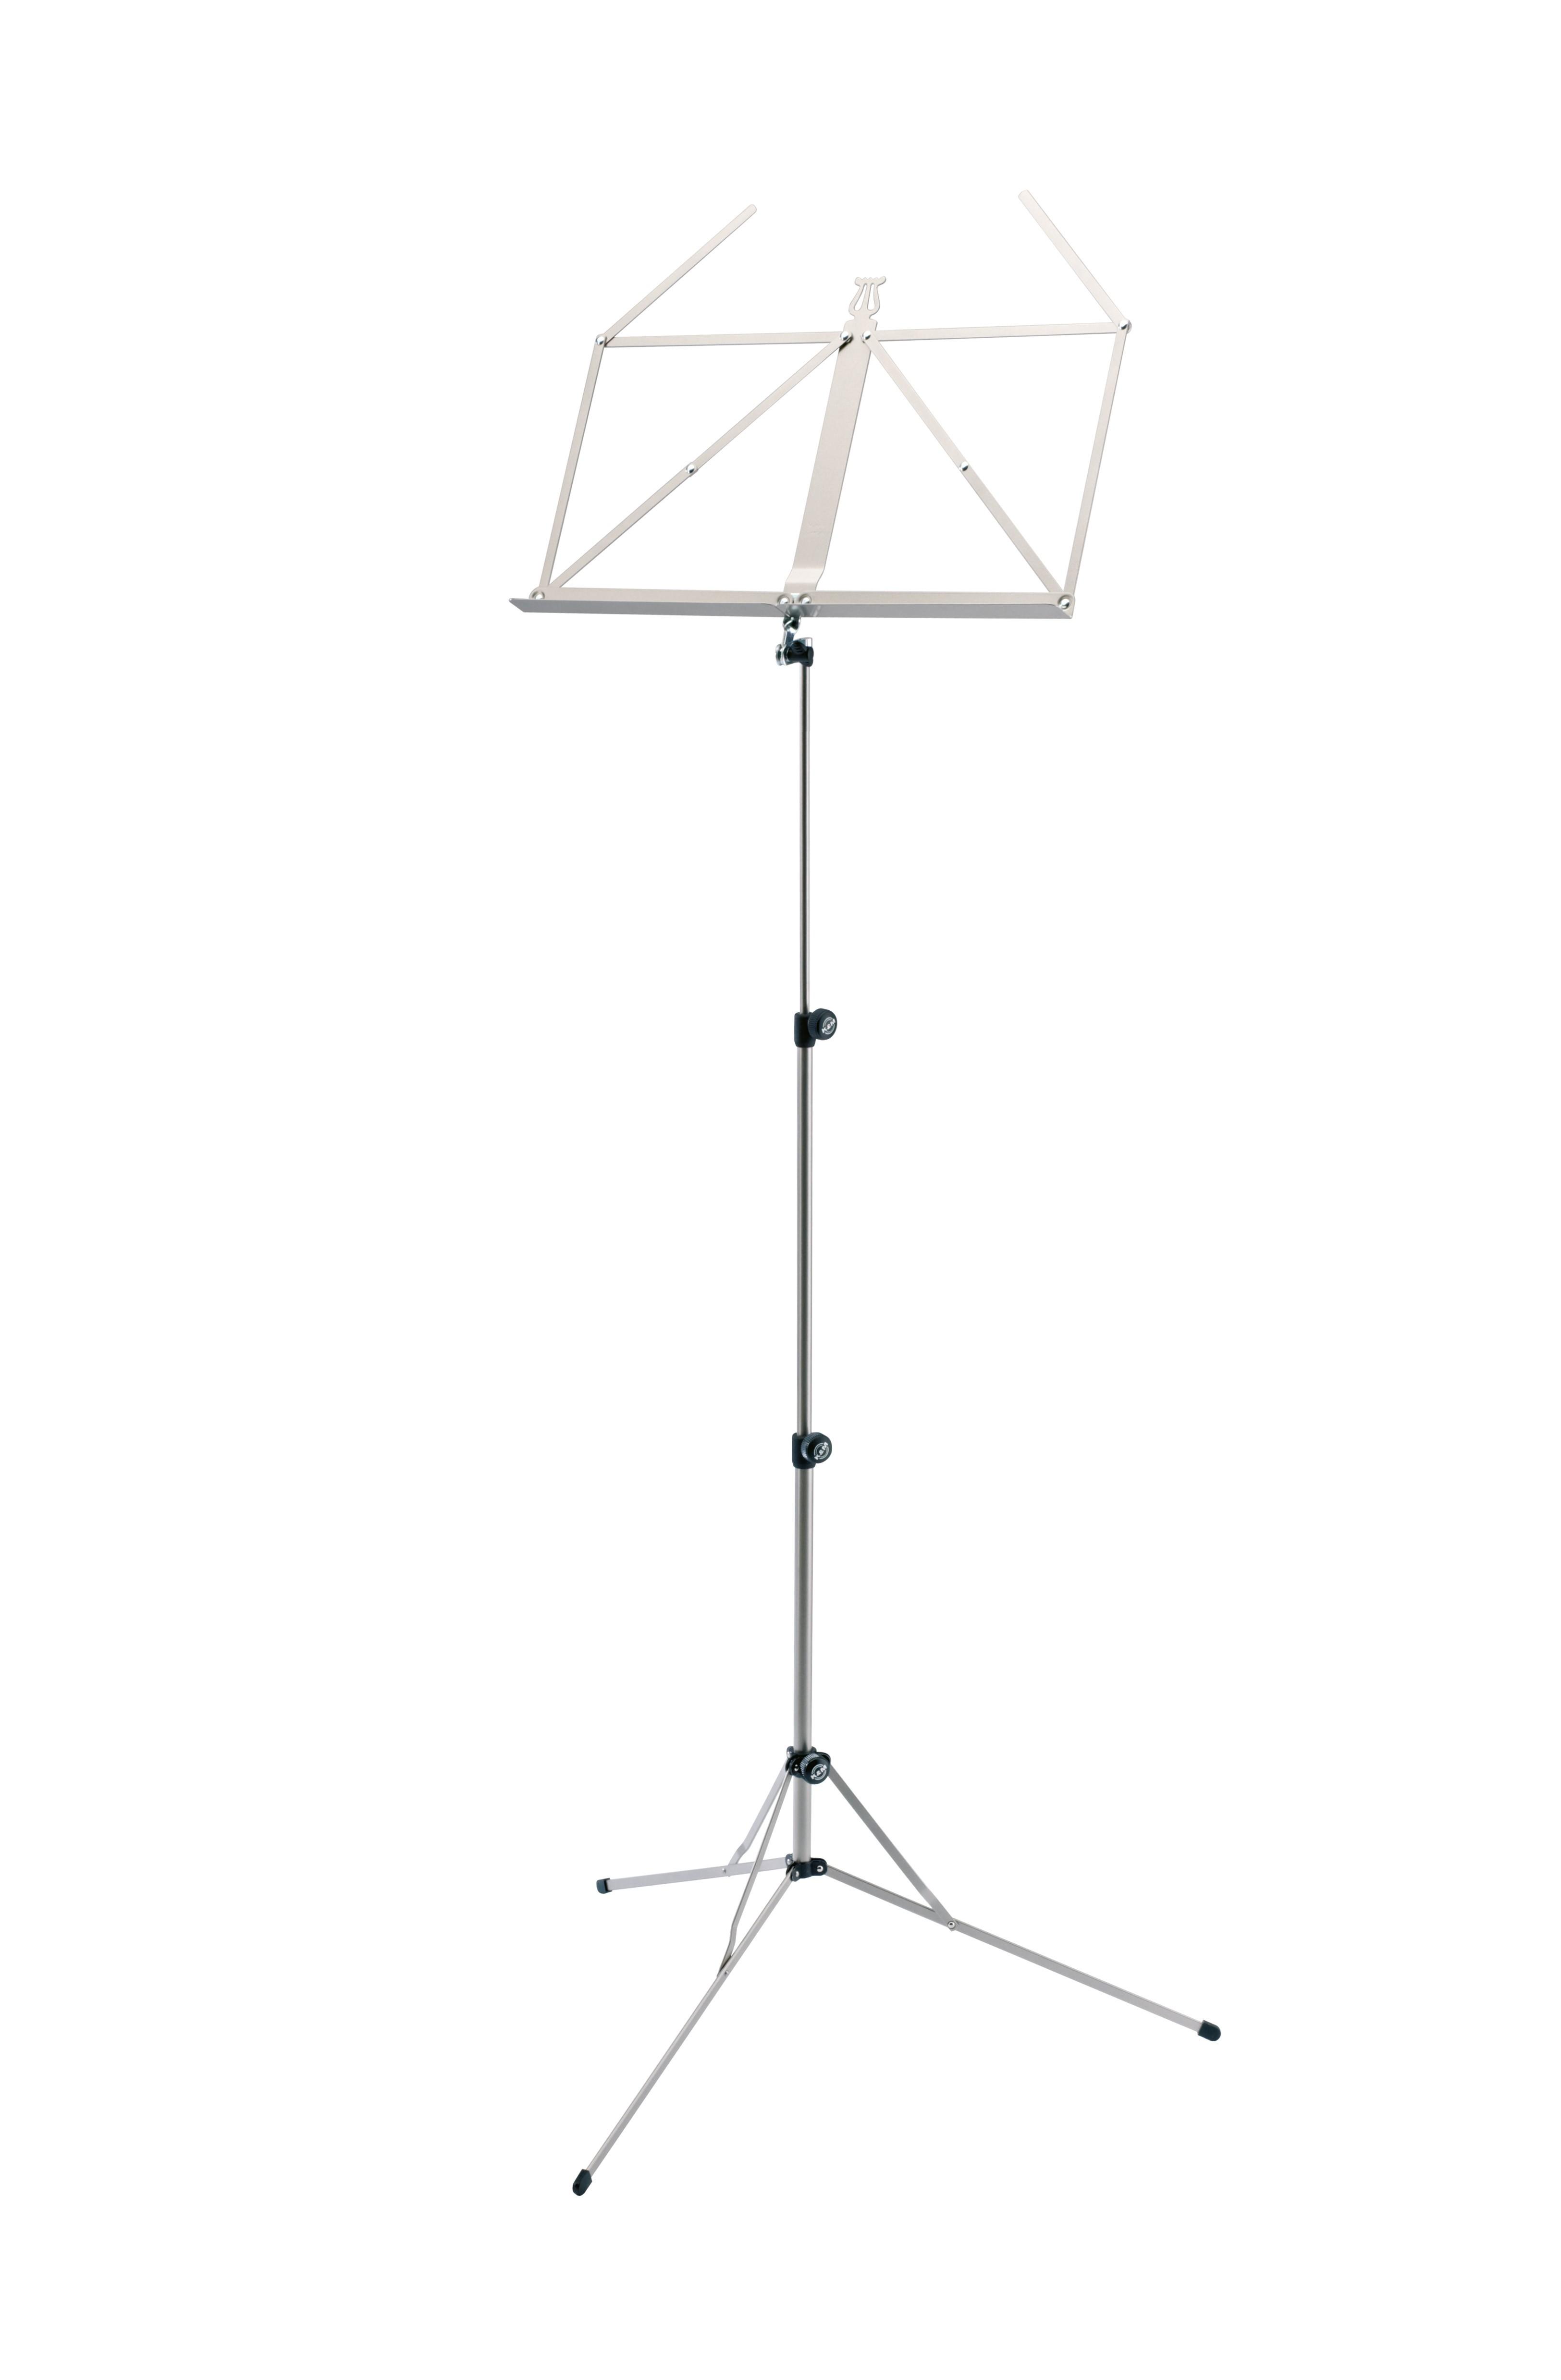 Konig & Meyer 101 Music Stand - Nickel